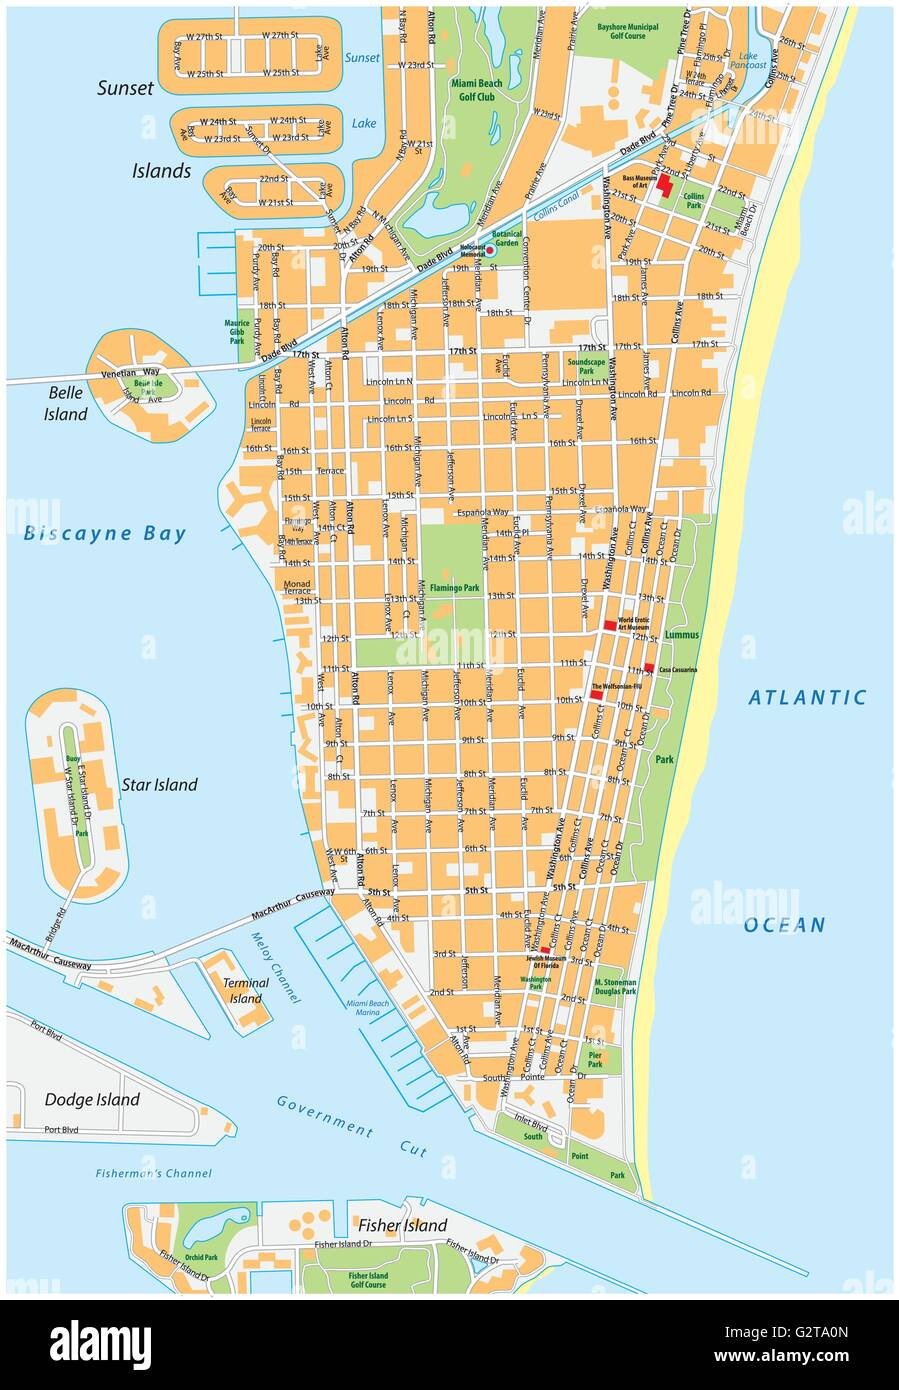 miami beach detaillierte vektor straßenkarte mit namen